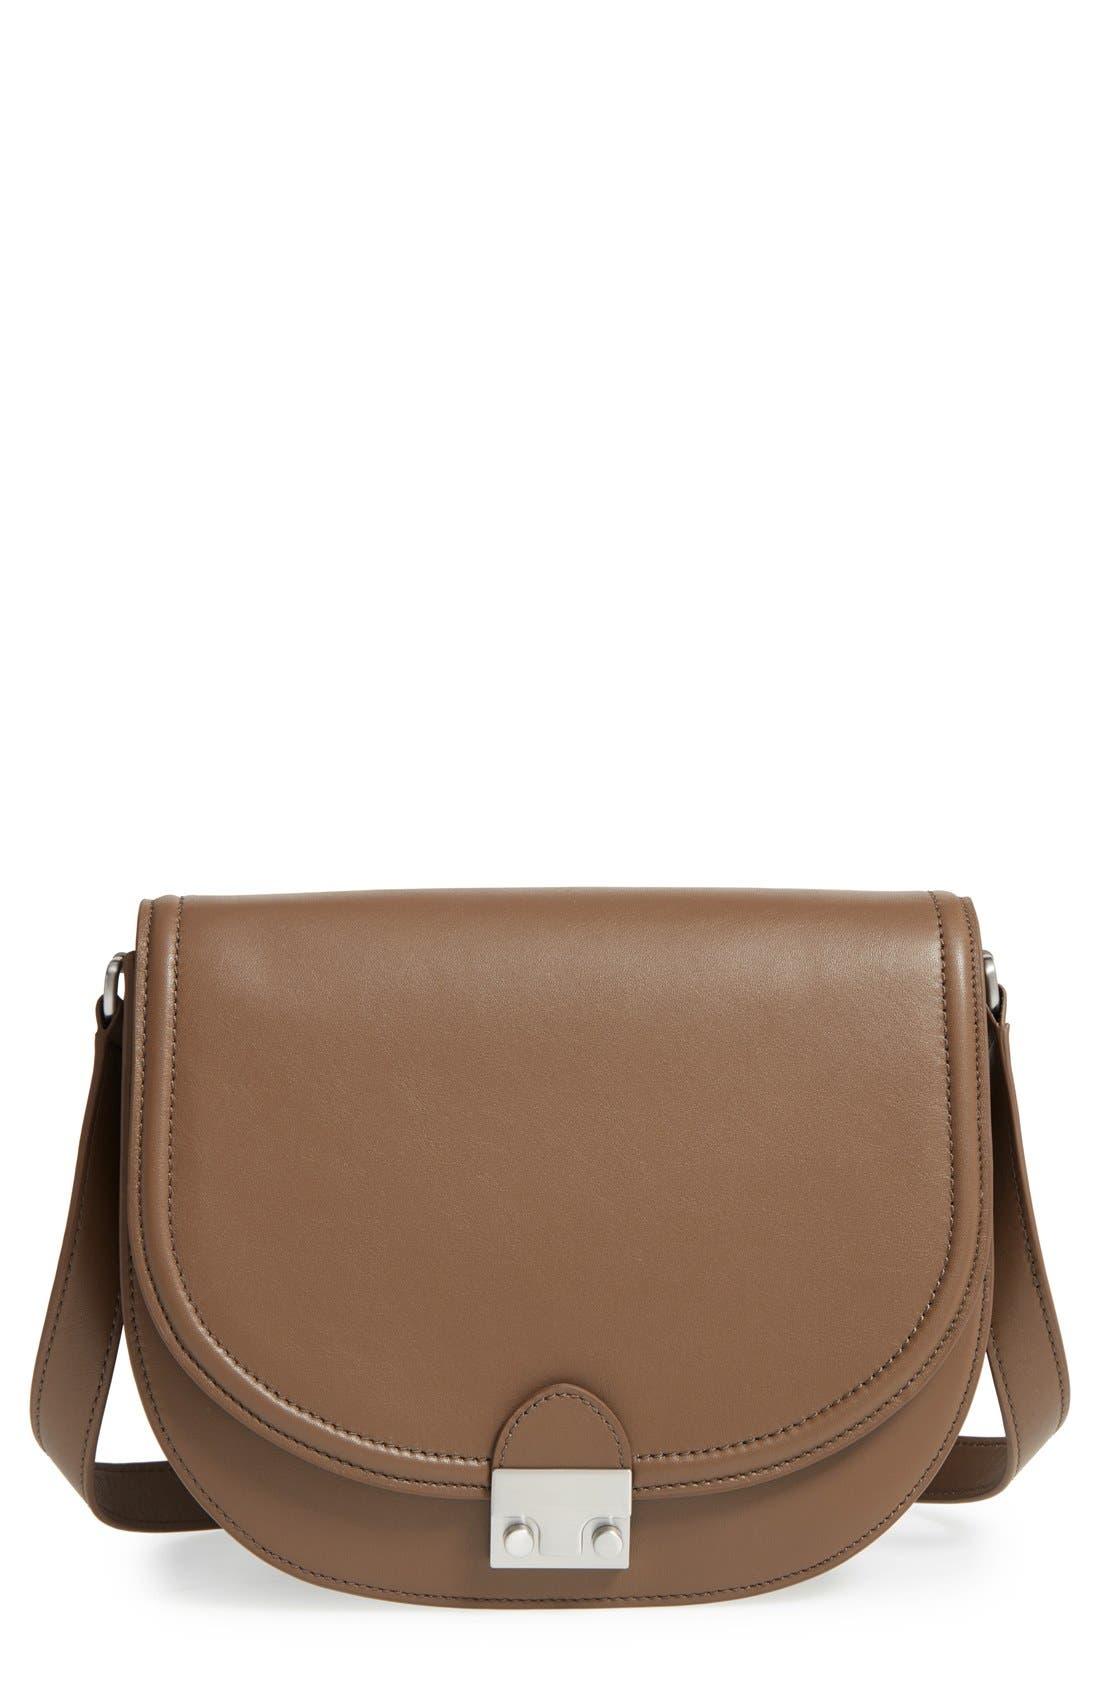 'Large' Leather Saddle Bag,                         Main,                         color, 300